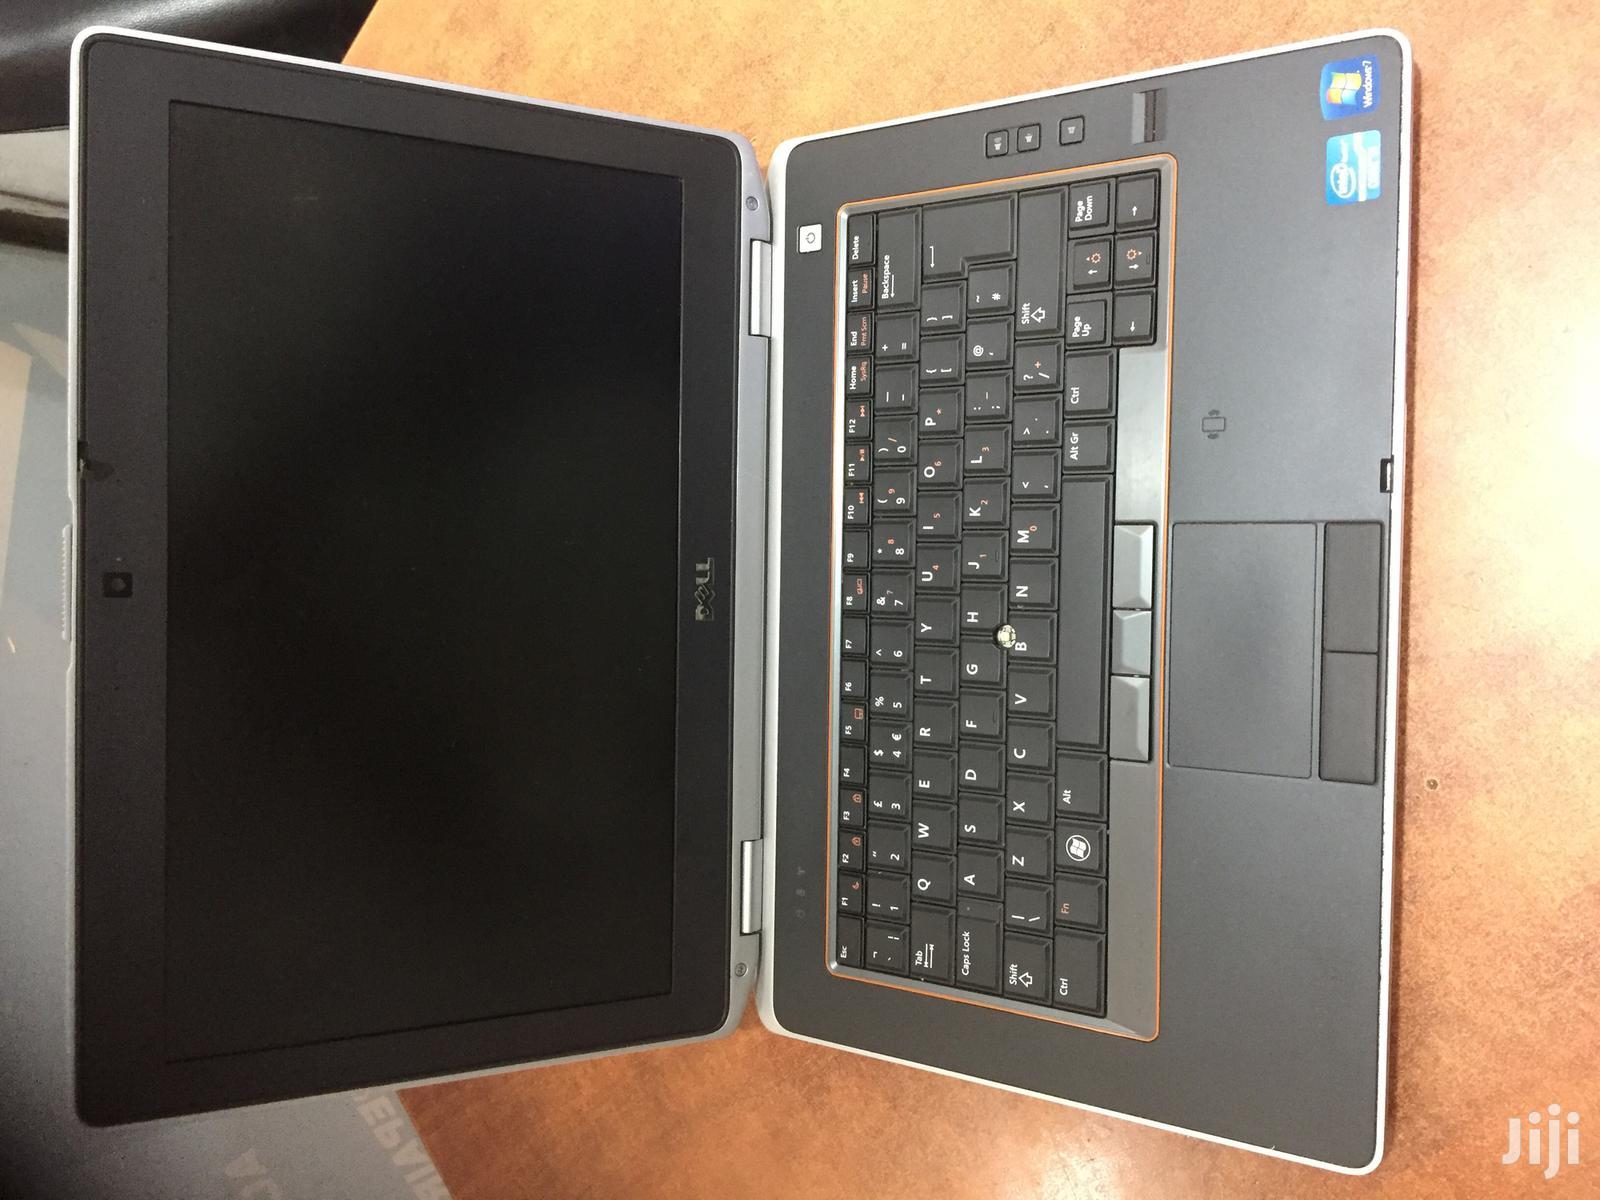 Laptop Dell Latitude E6420 8GB Intel Core I5 HDD 500GB   Laptops & Computers for sale in Kampala, Central Region, Uganda